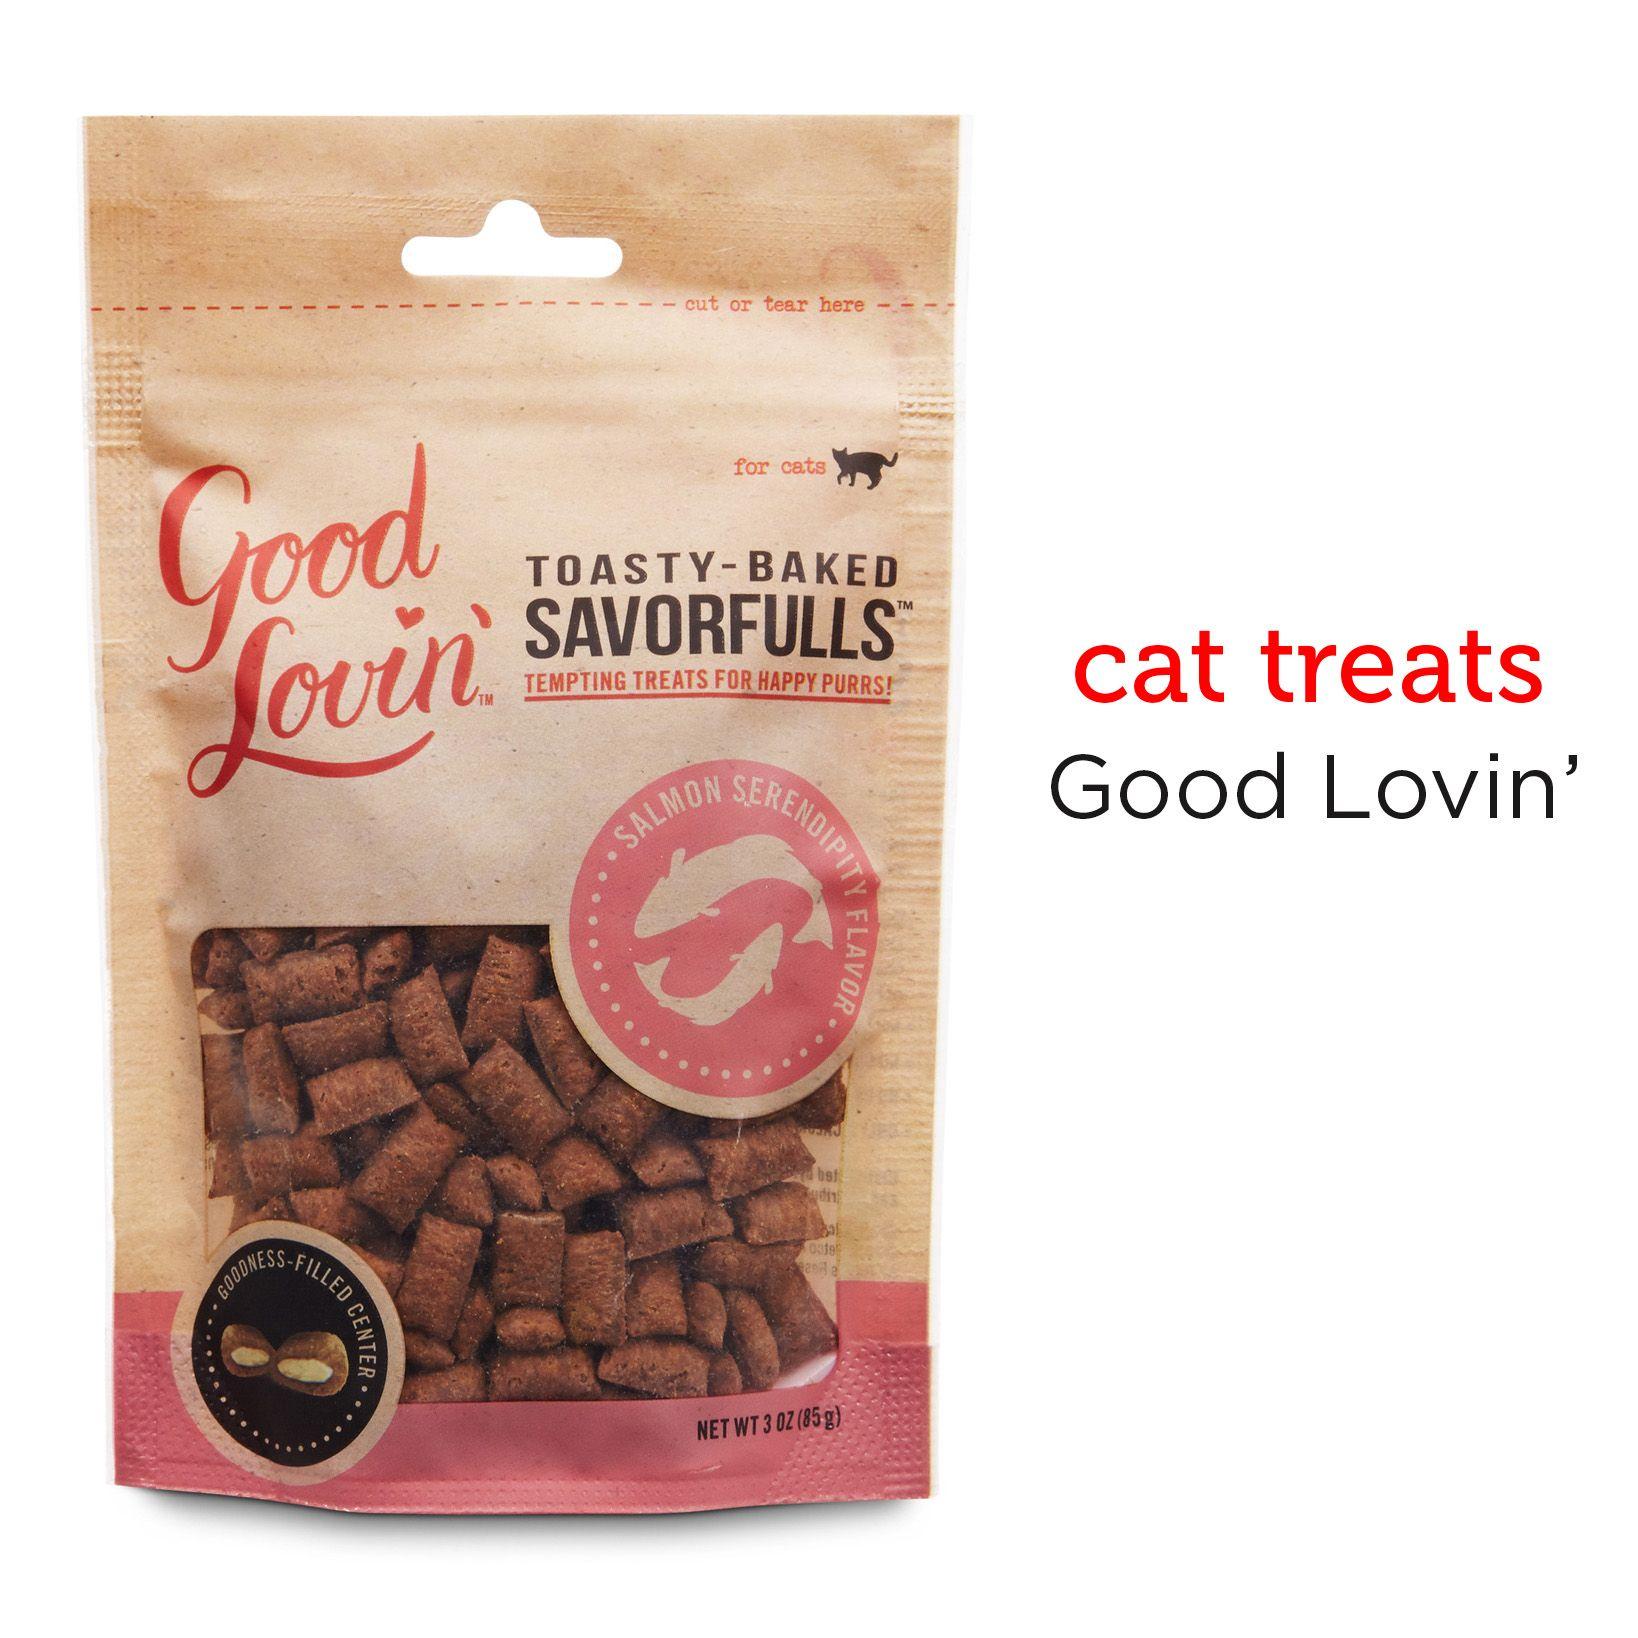 Cat treats from petcos holiday gift guide cat treats